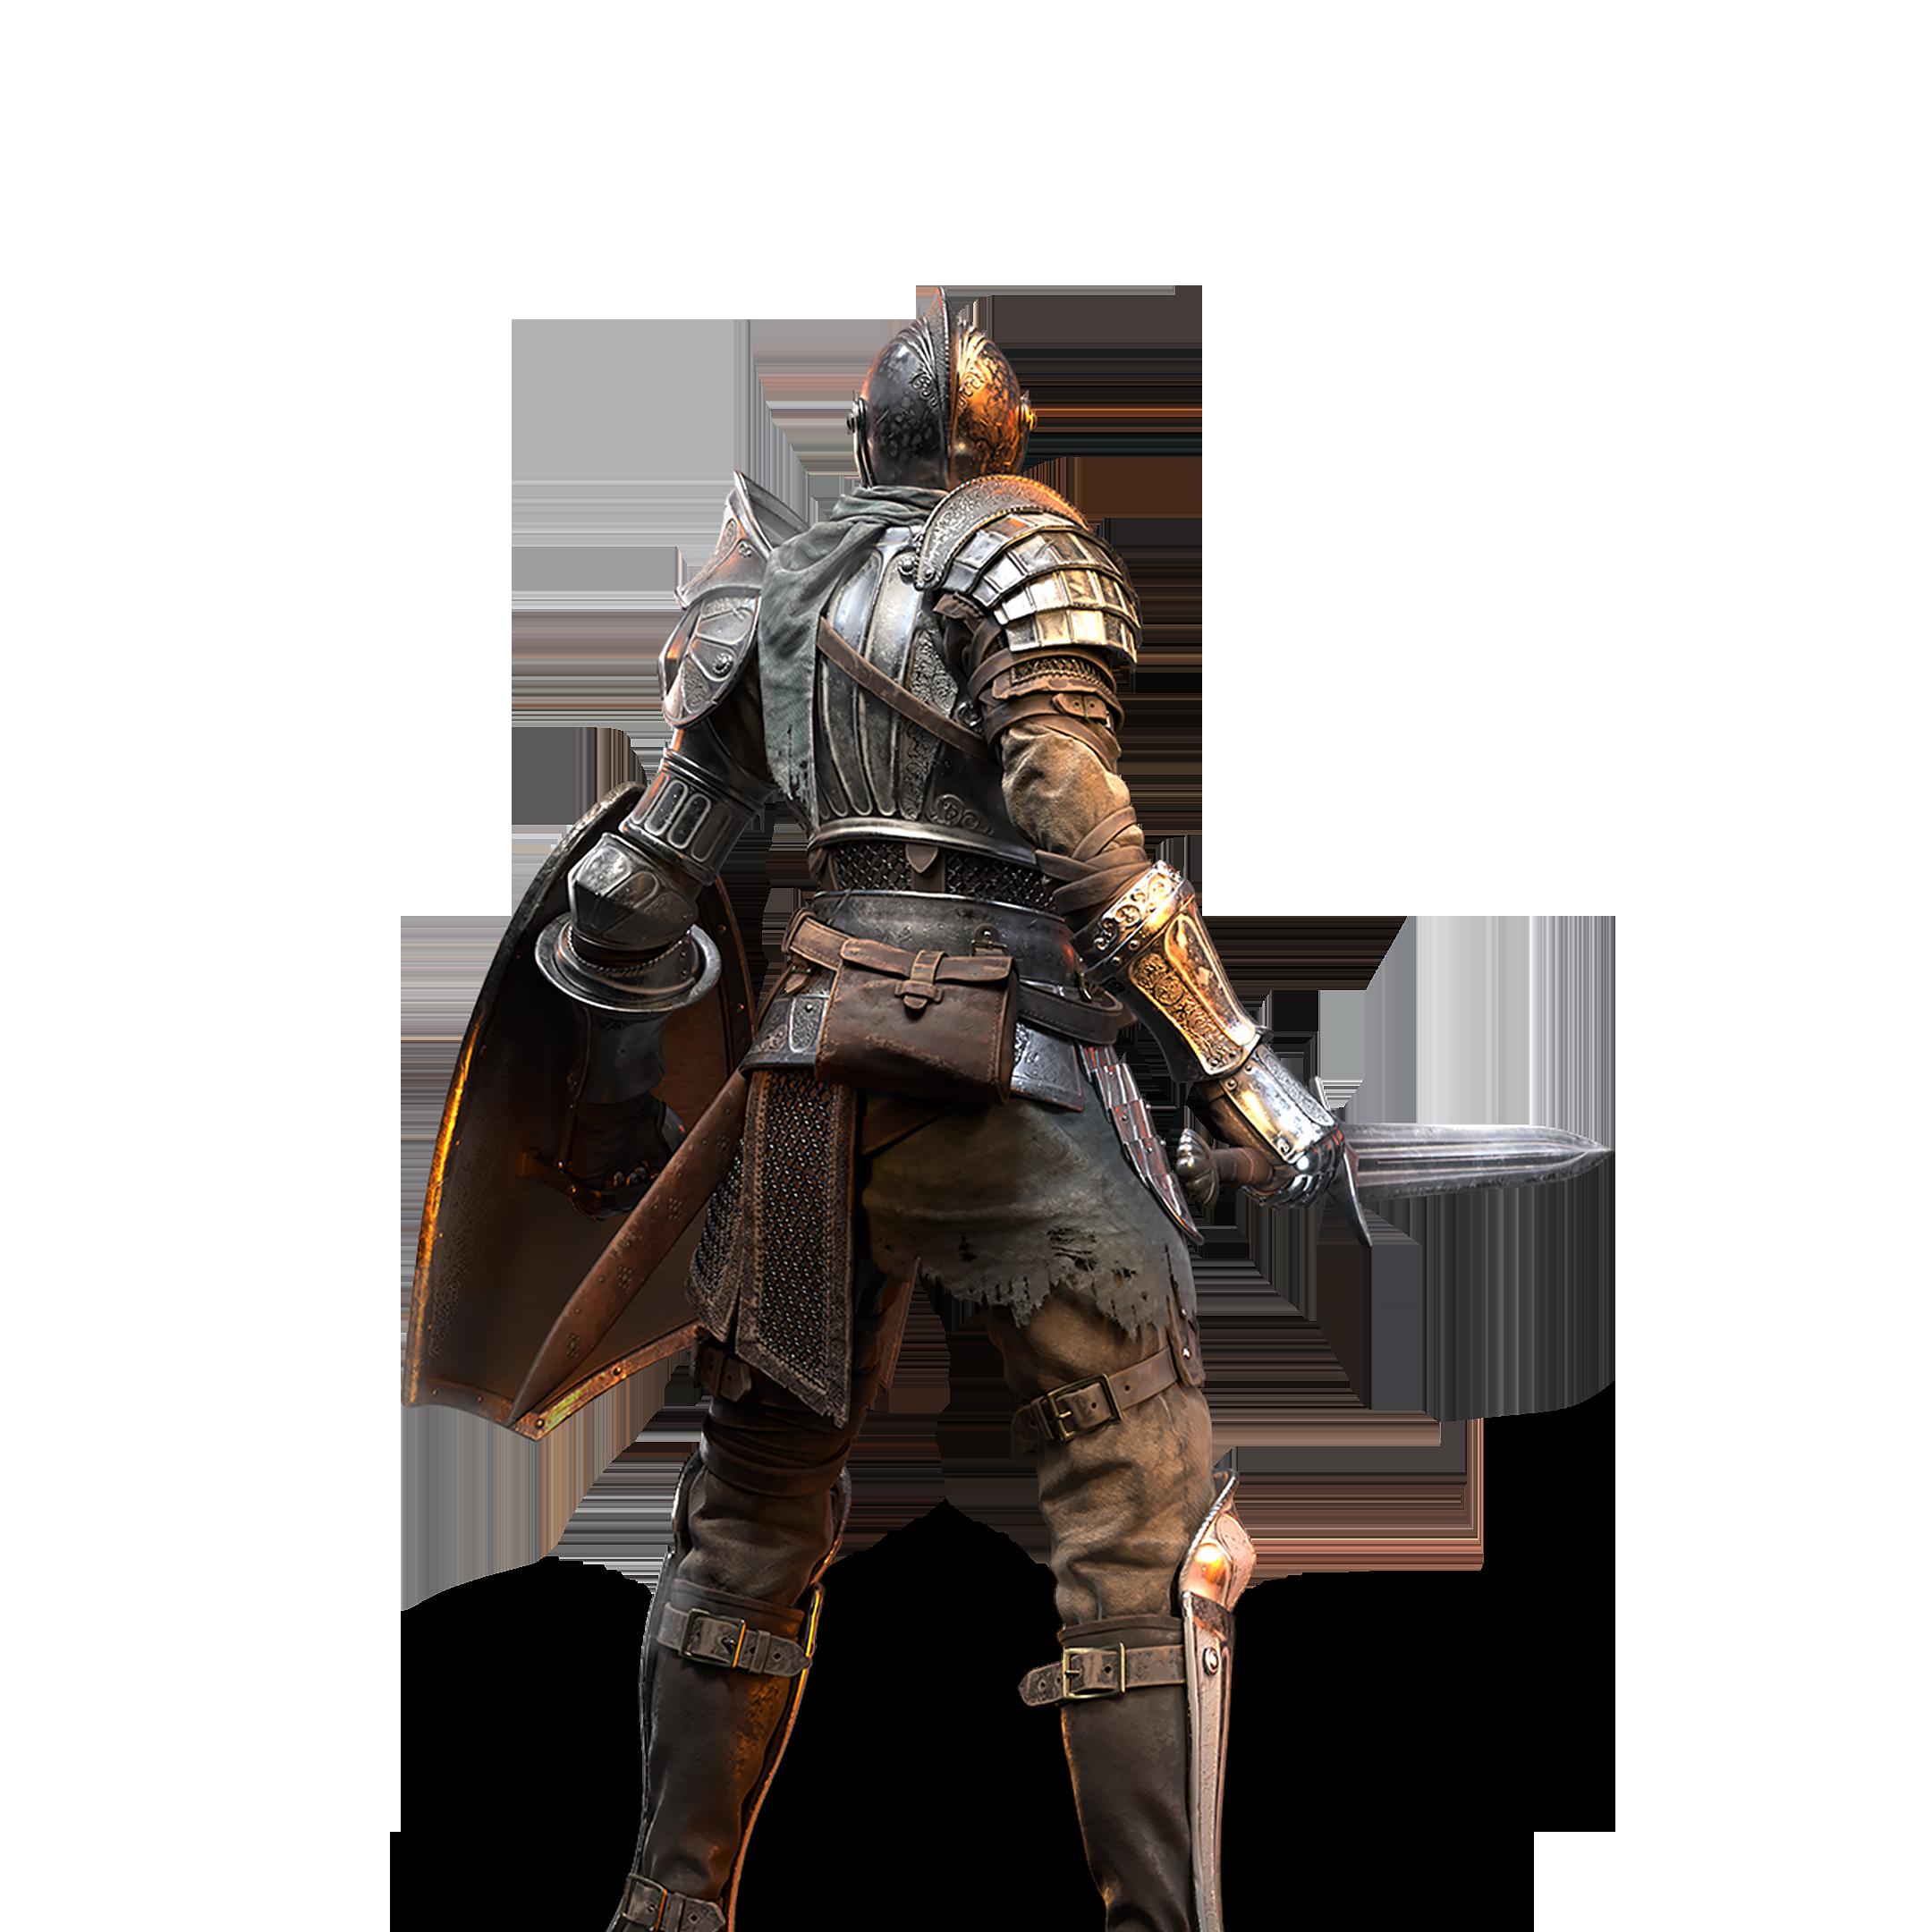 [HERO] Demons Souls - Character